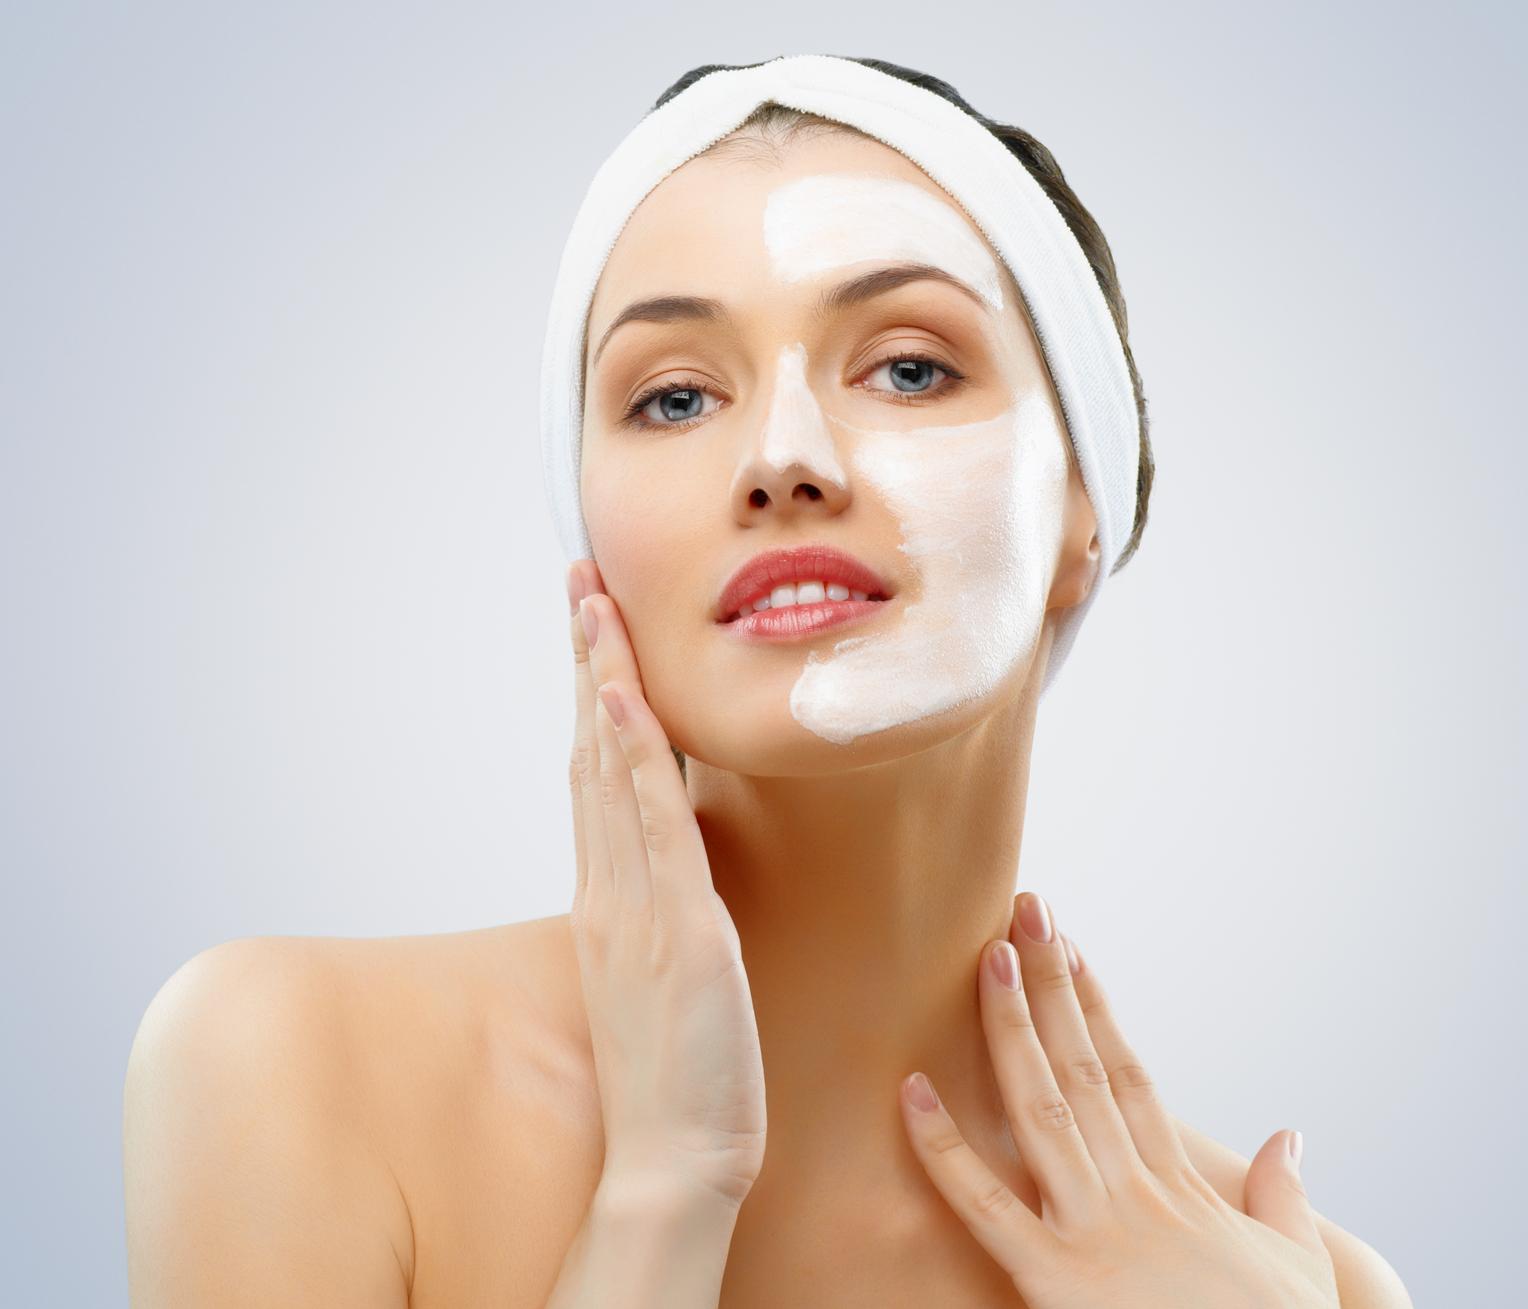 A beginner's guide to creating natural skin care recipes ca-greenbizalliance.com.